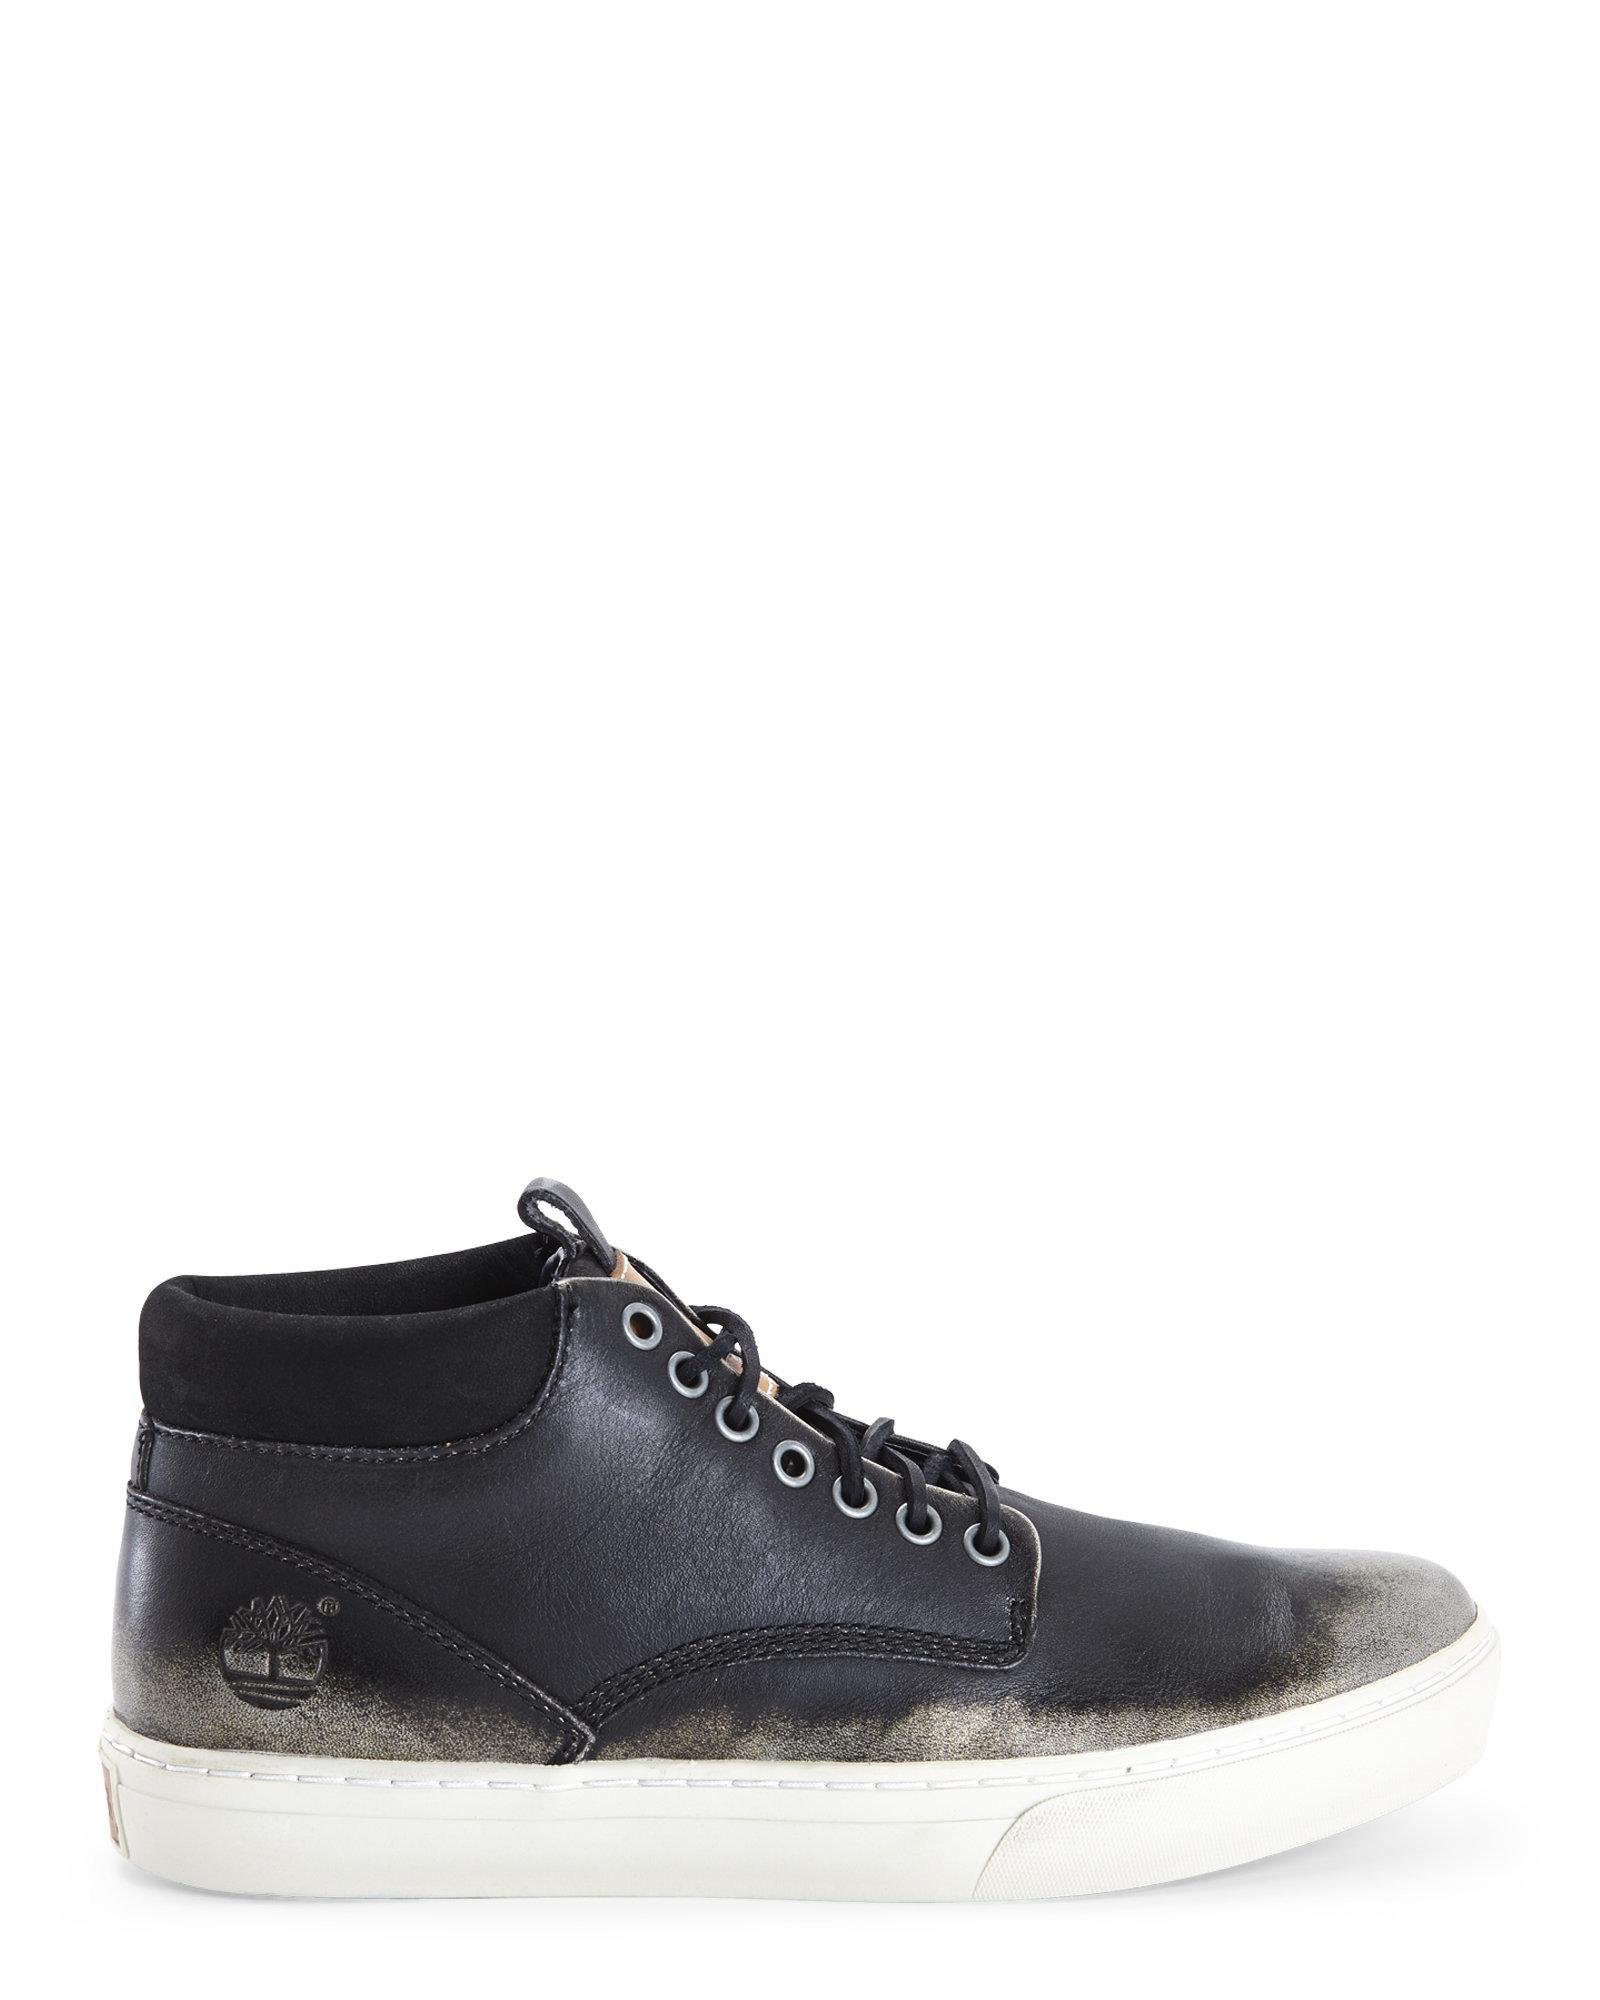 Men S Adventure Cupsole Chukka Shoes All Black